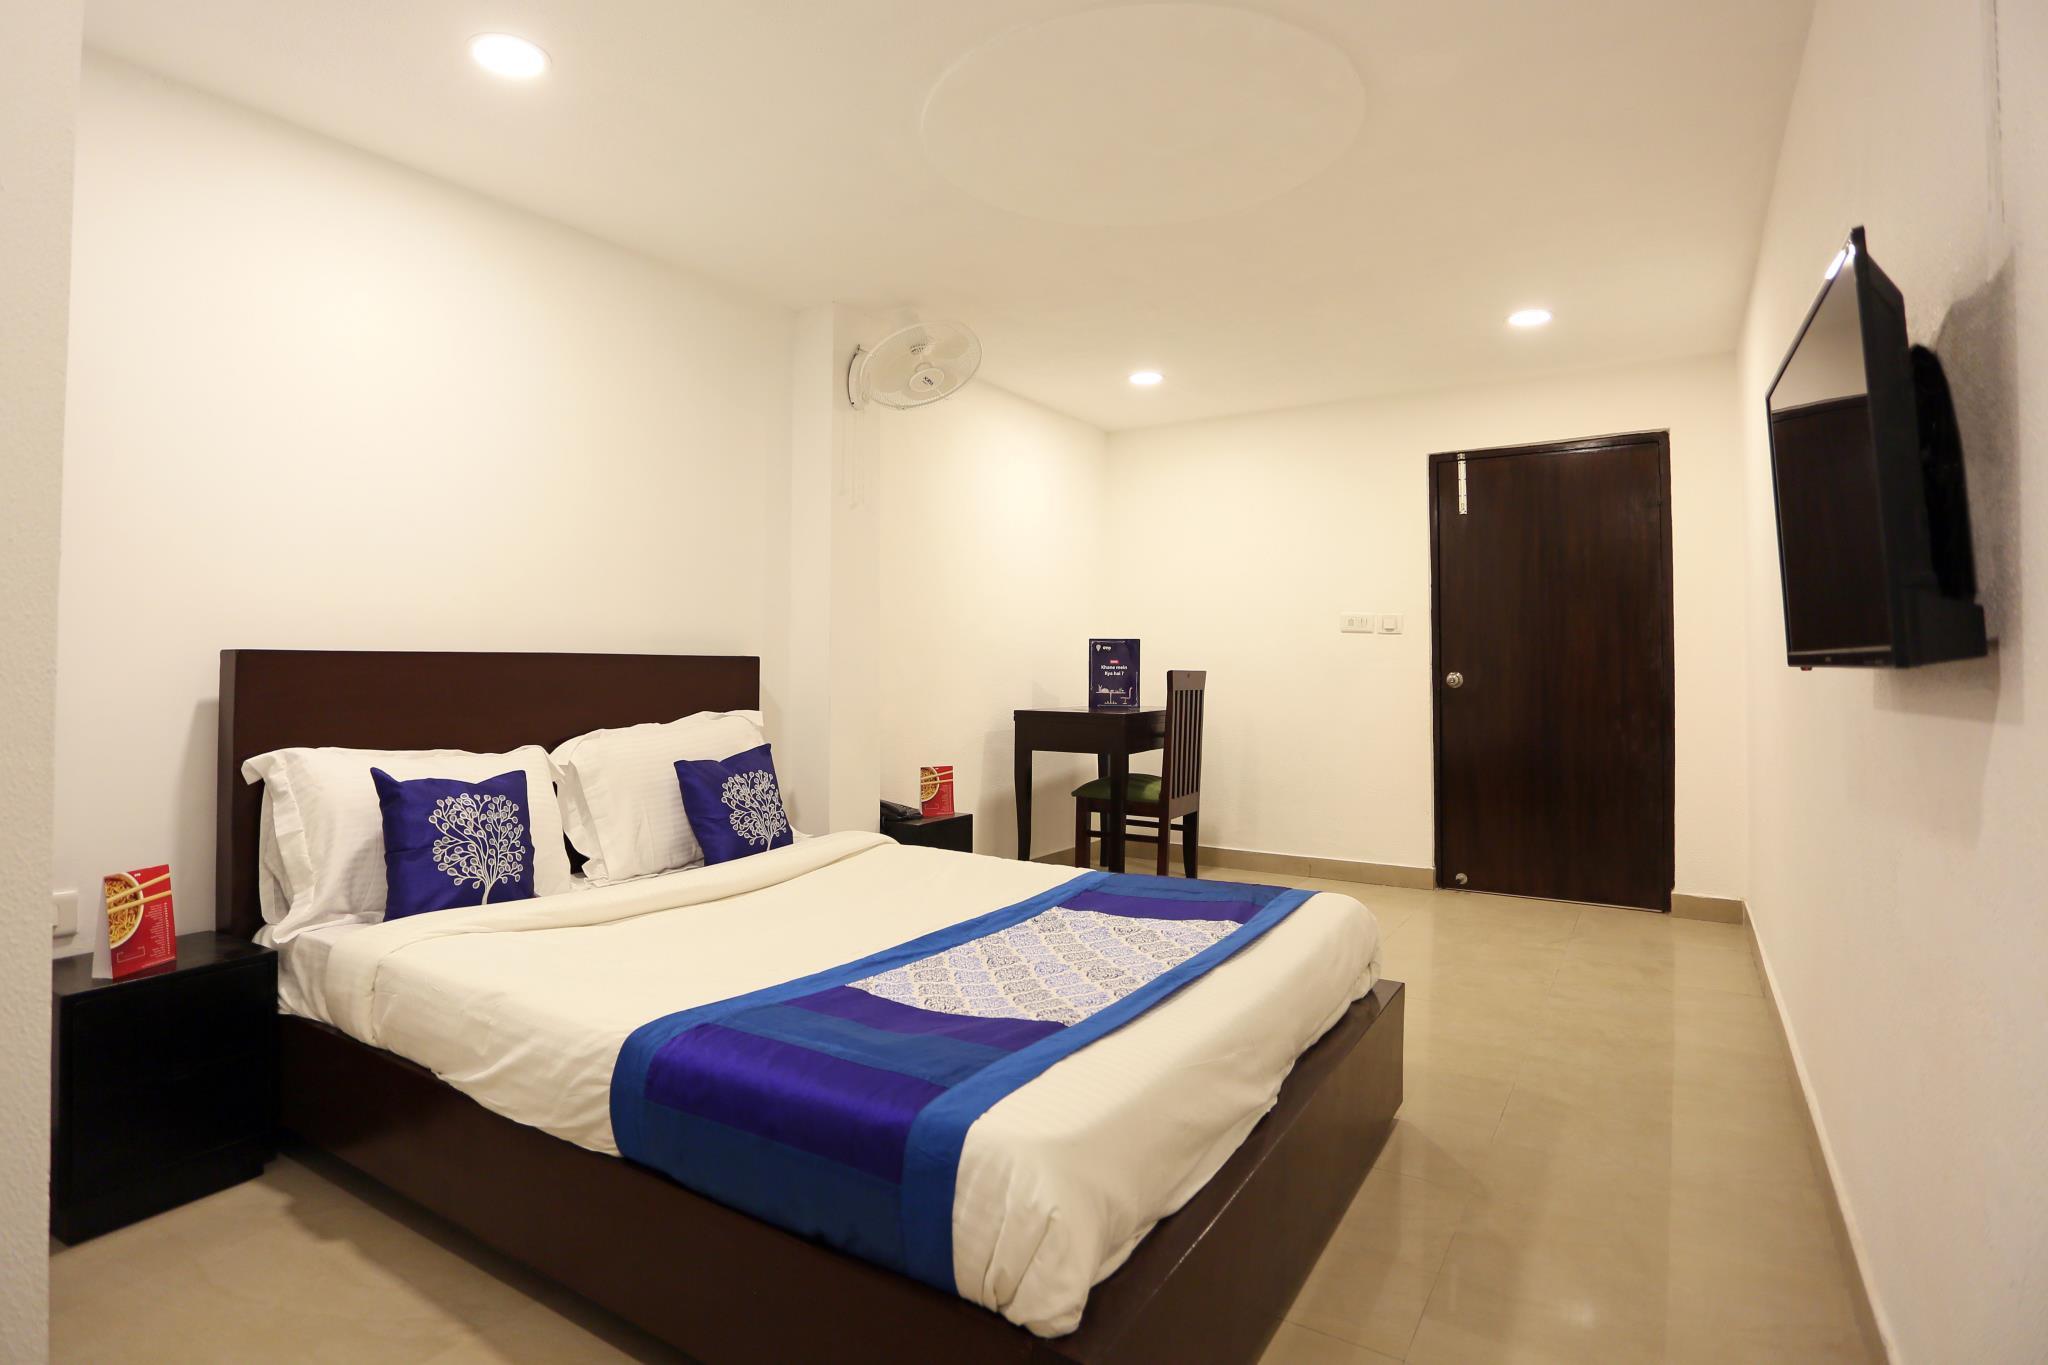 Airport Hotel Ravin